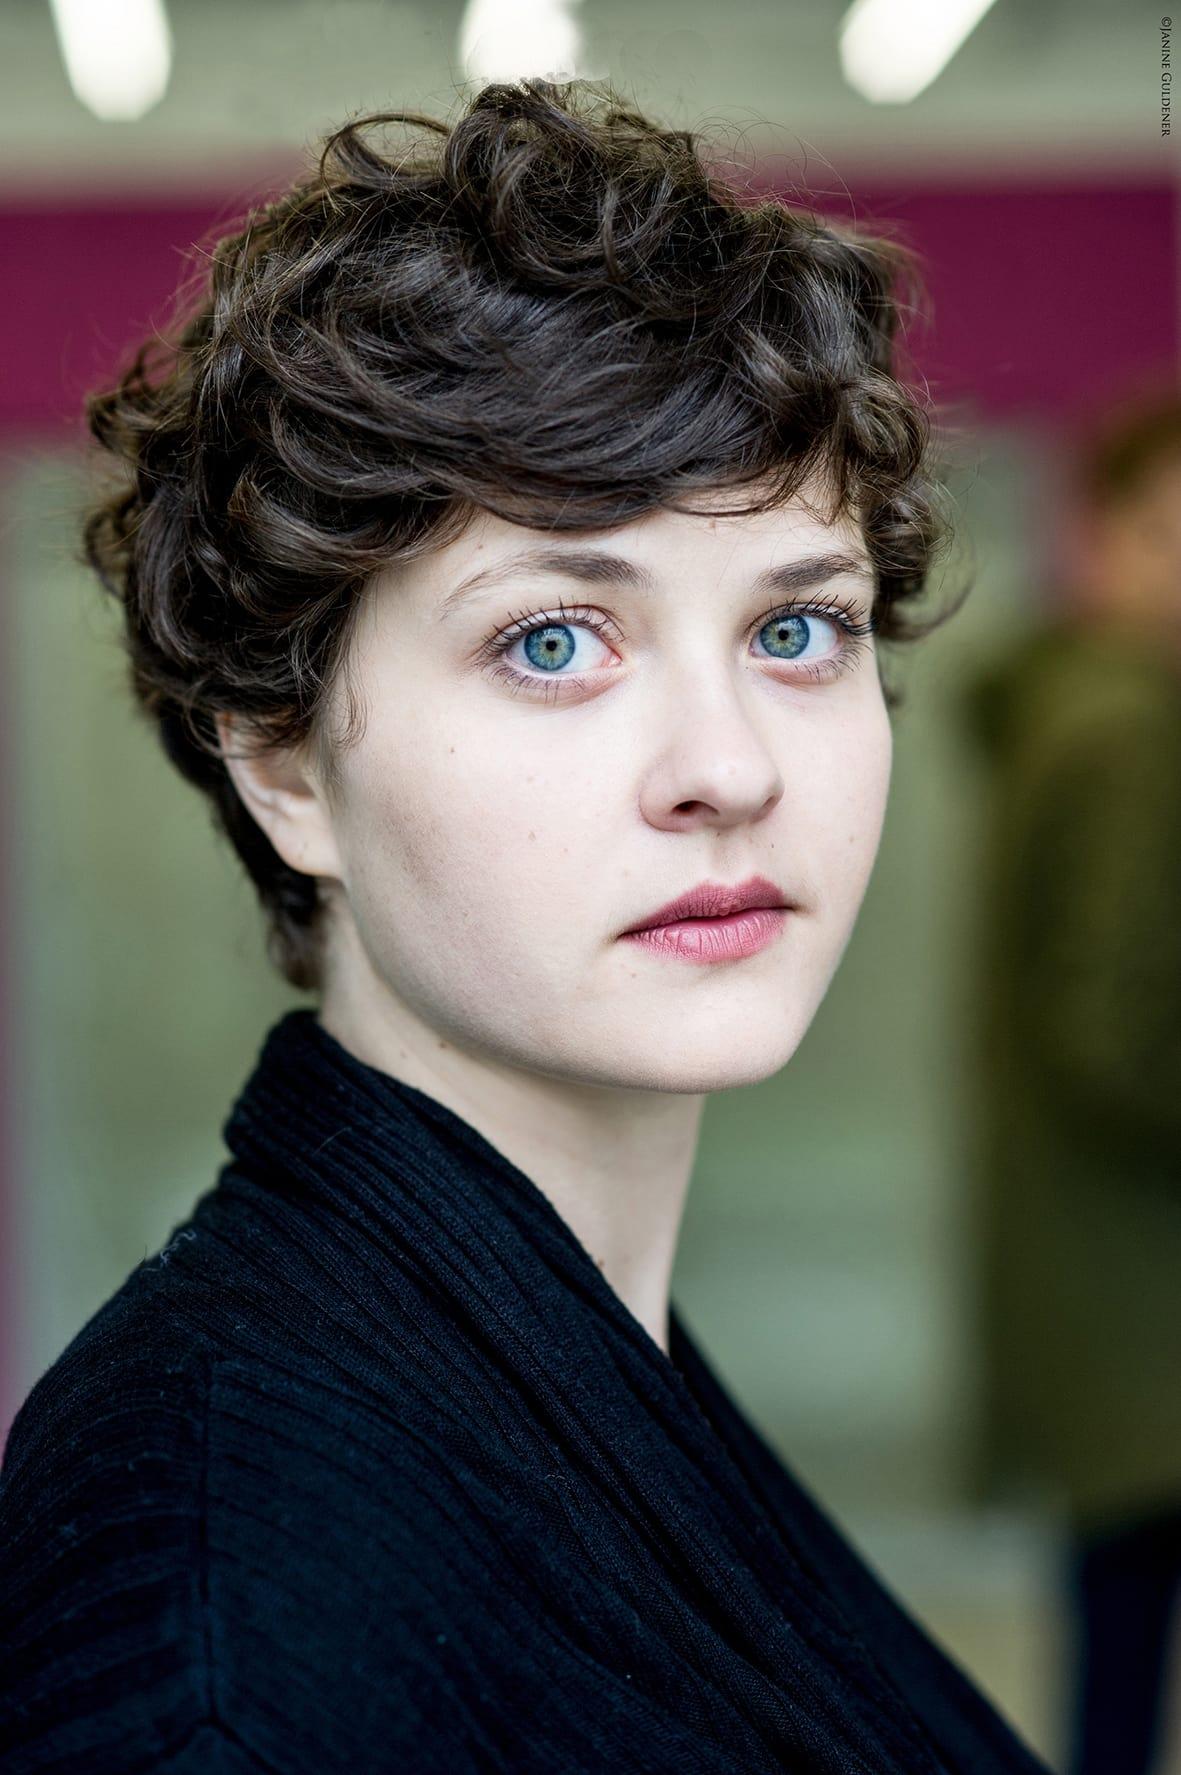 Annina Polivka